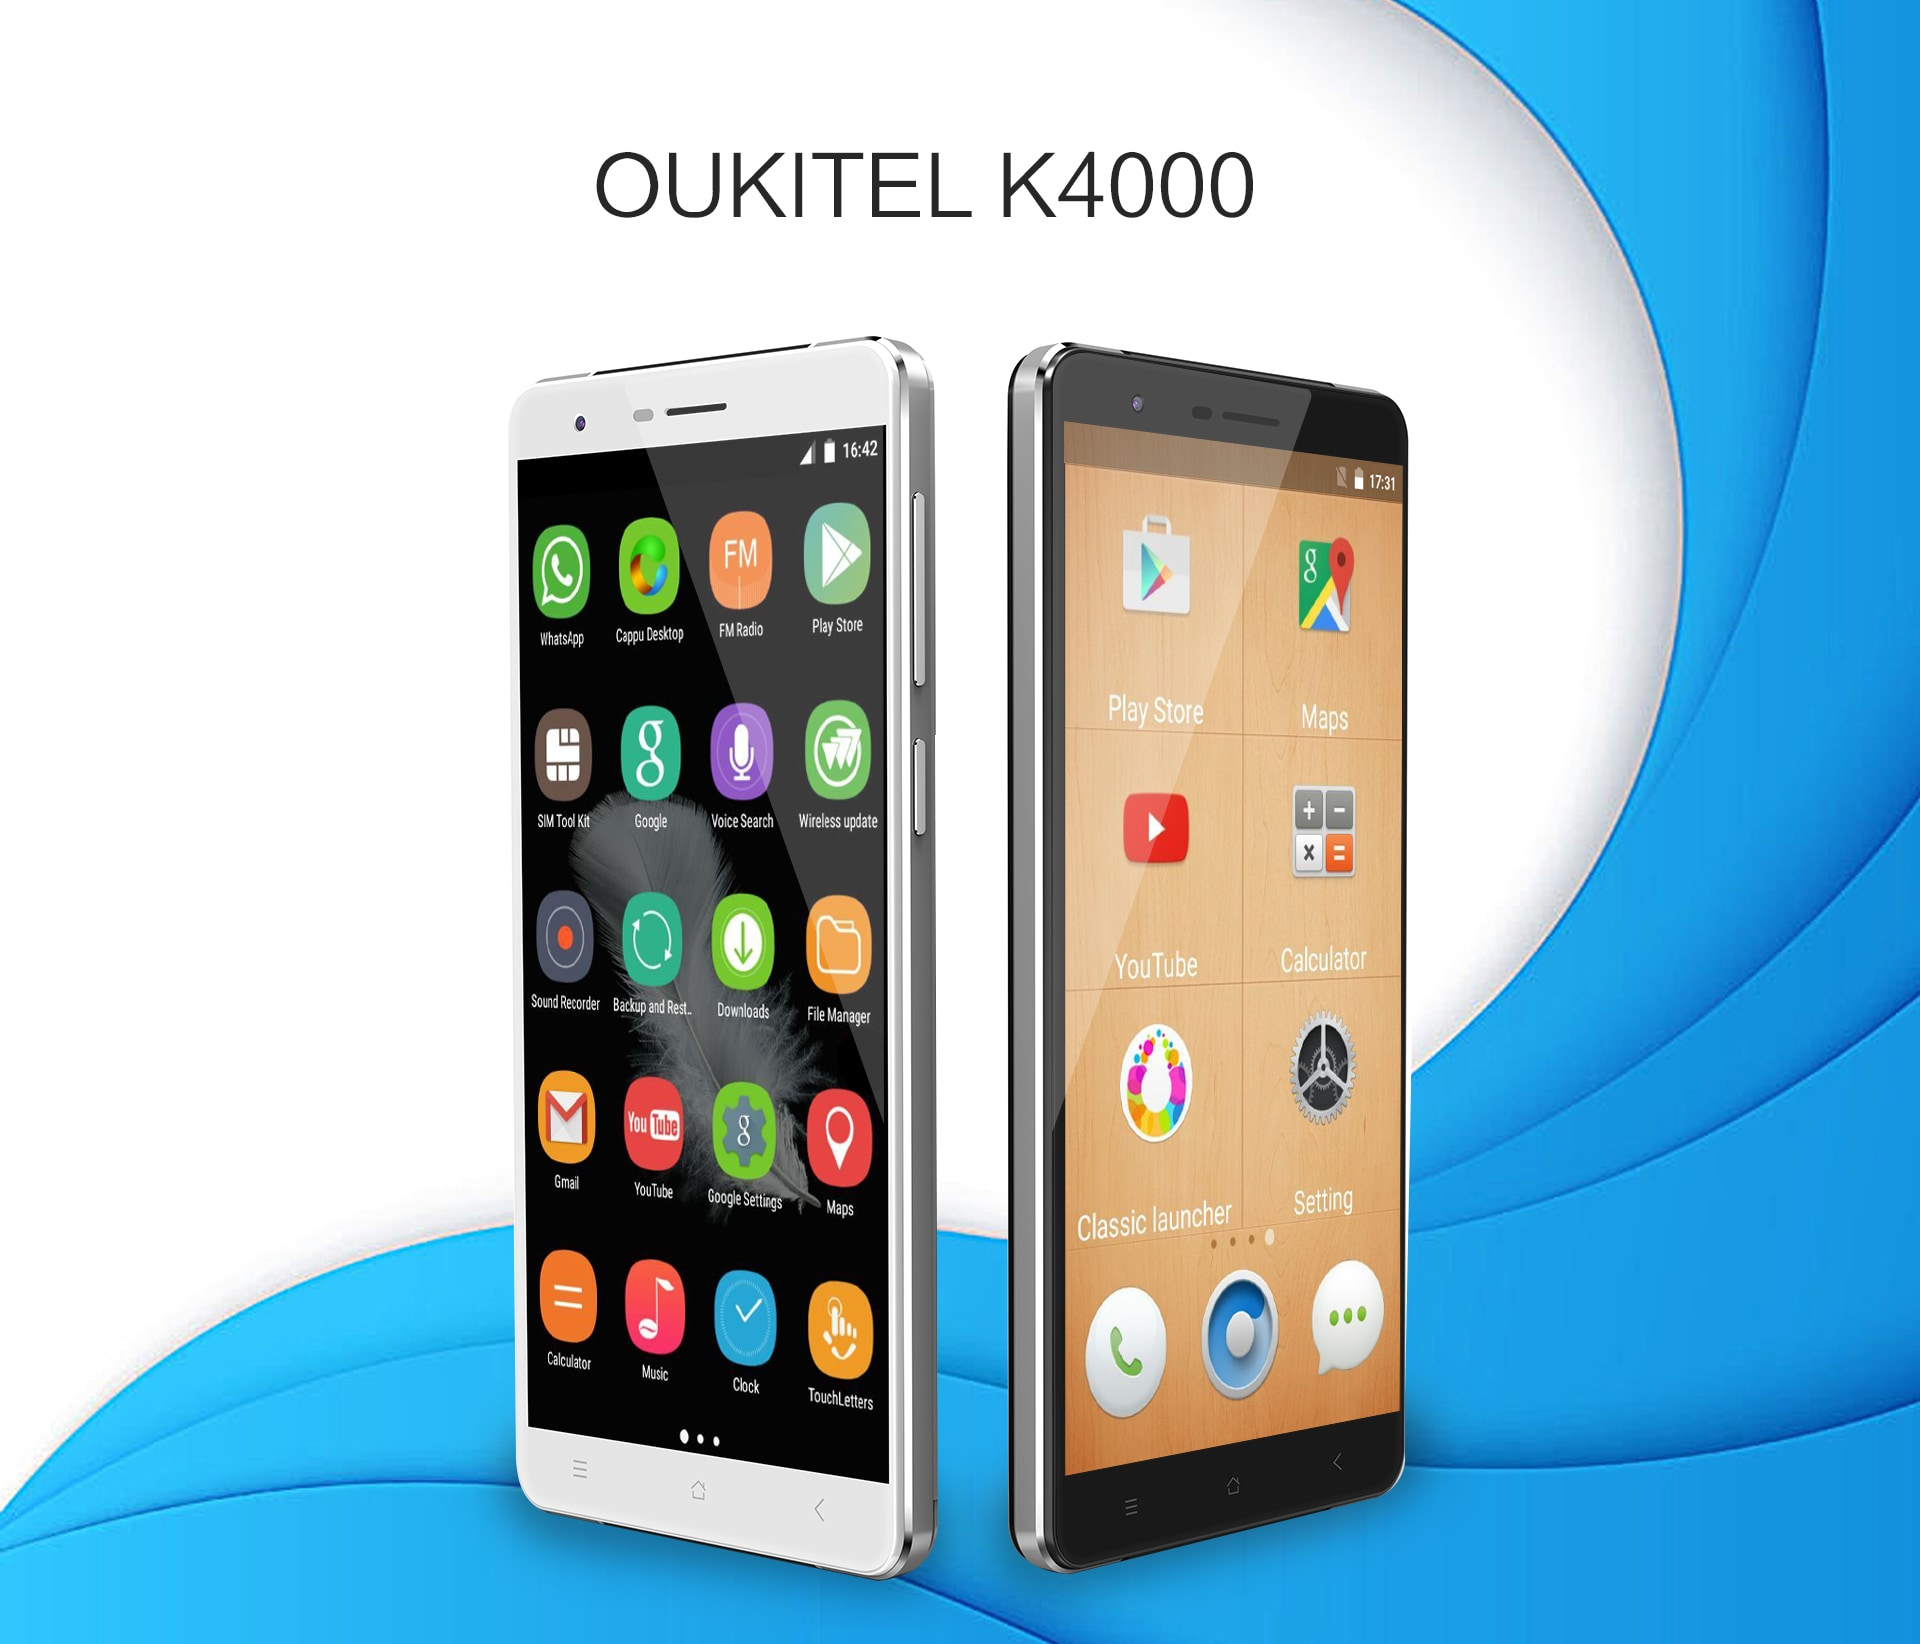 K4000-new-version.jpg